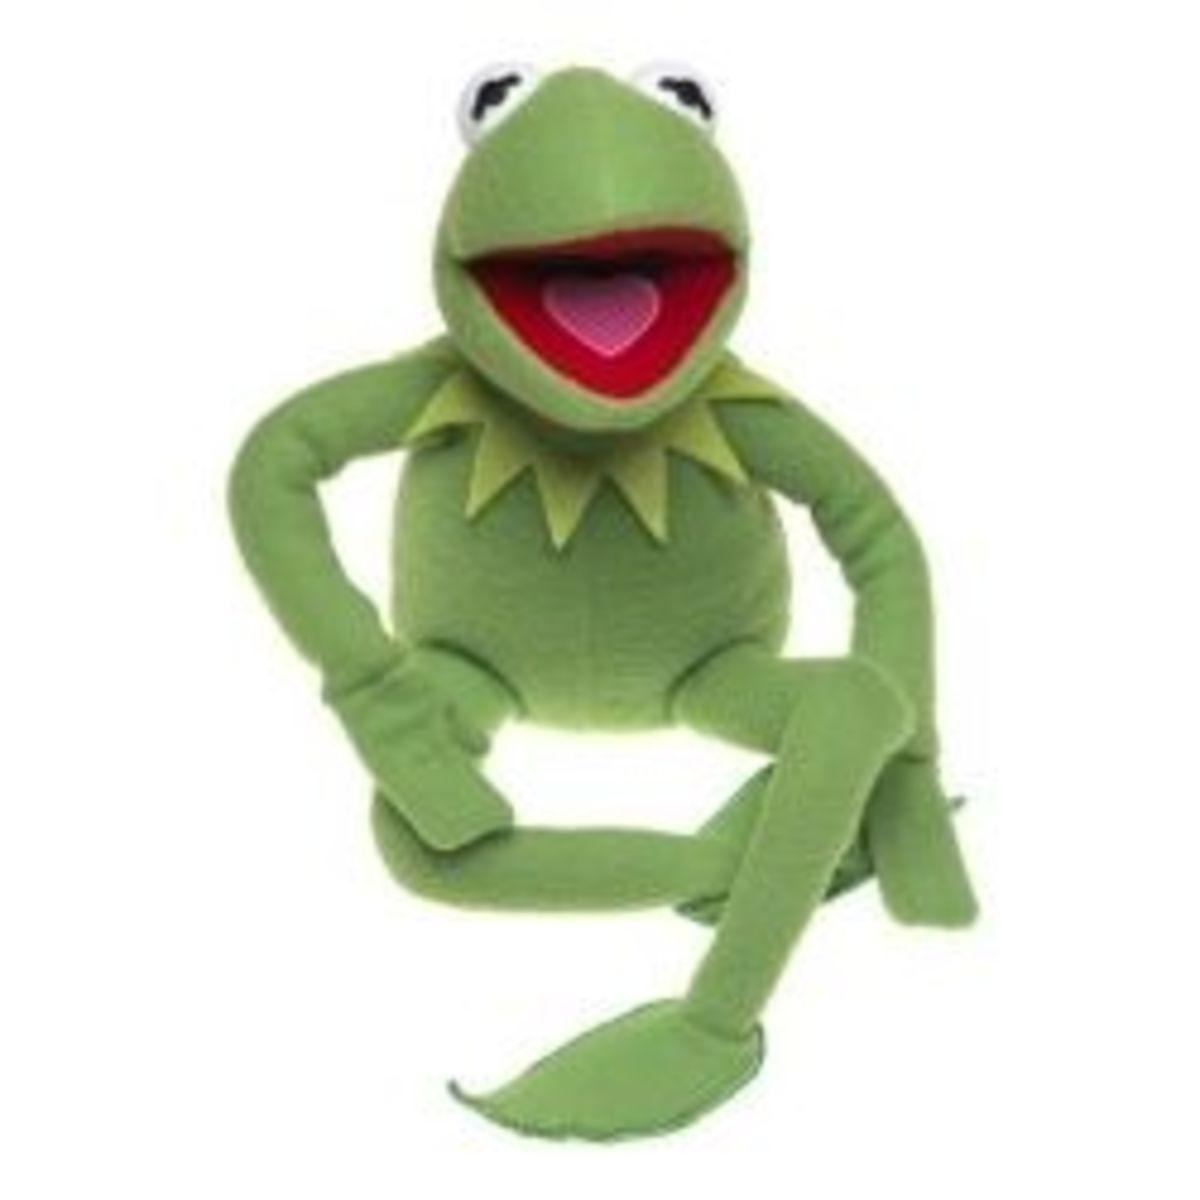 Kermit The Frog Plush